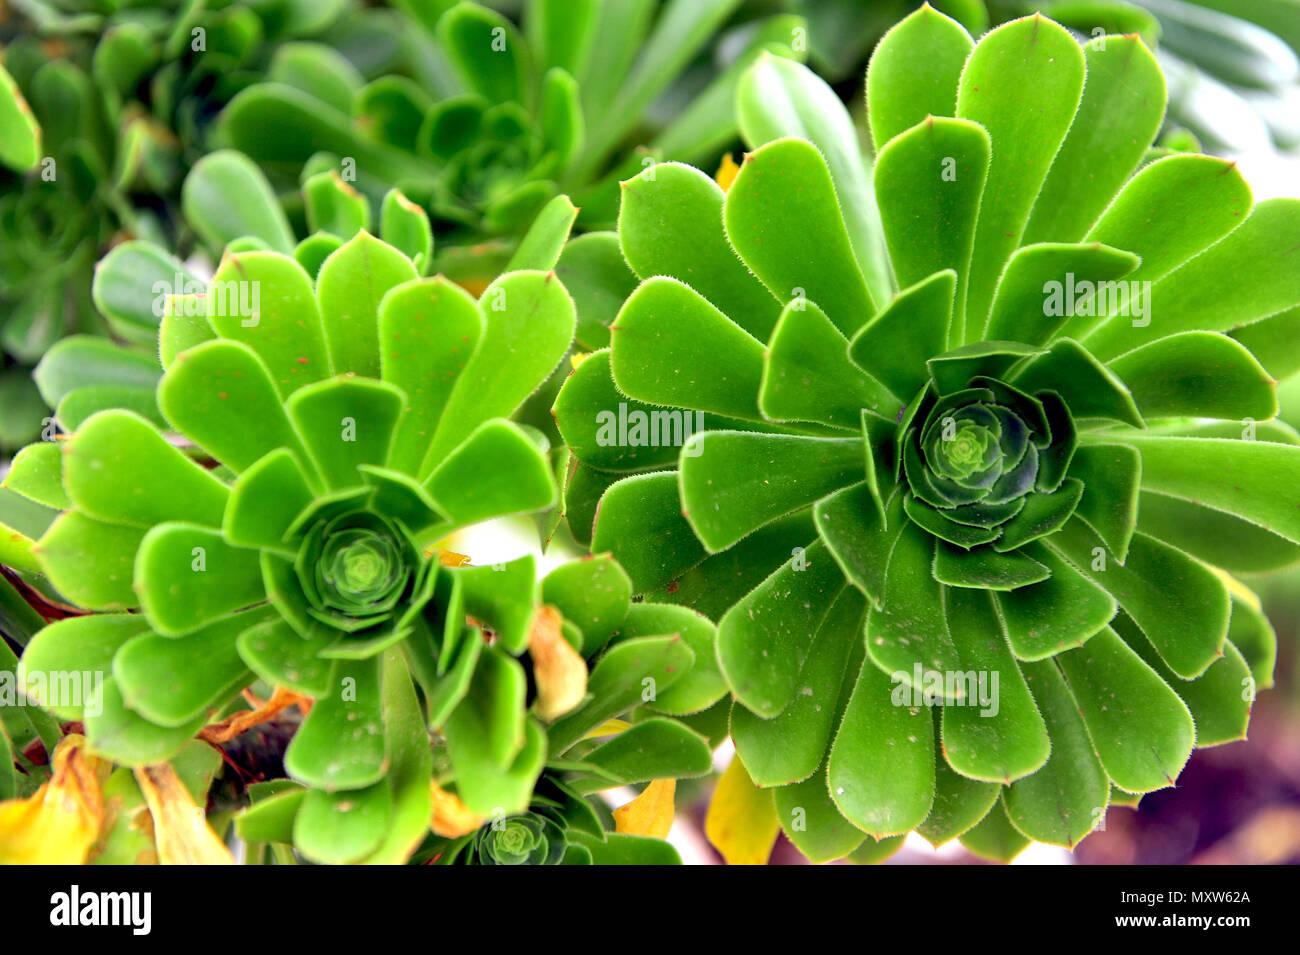 Green Geometric Mediterranean Plants In Bloom Stock Photo